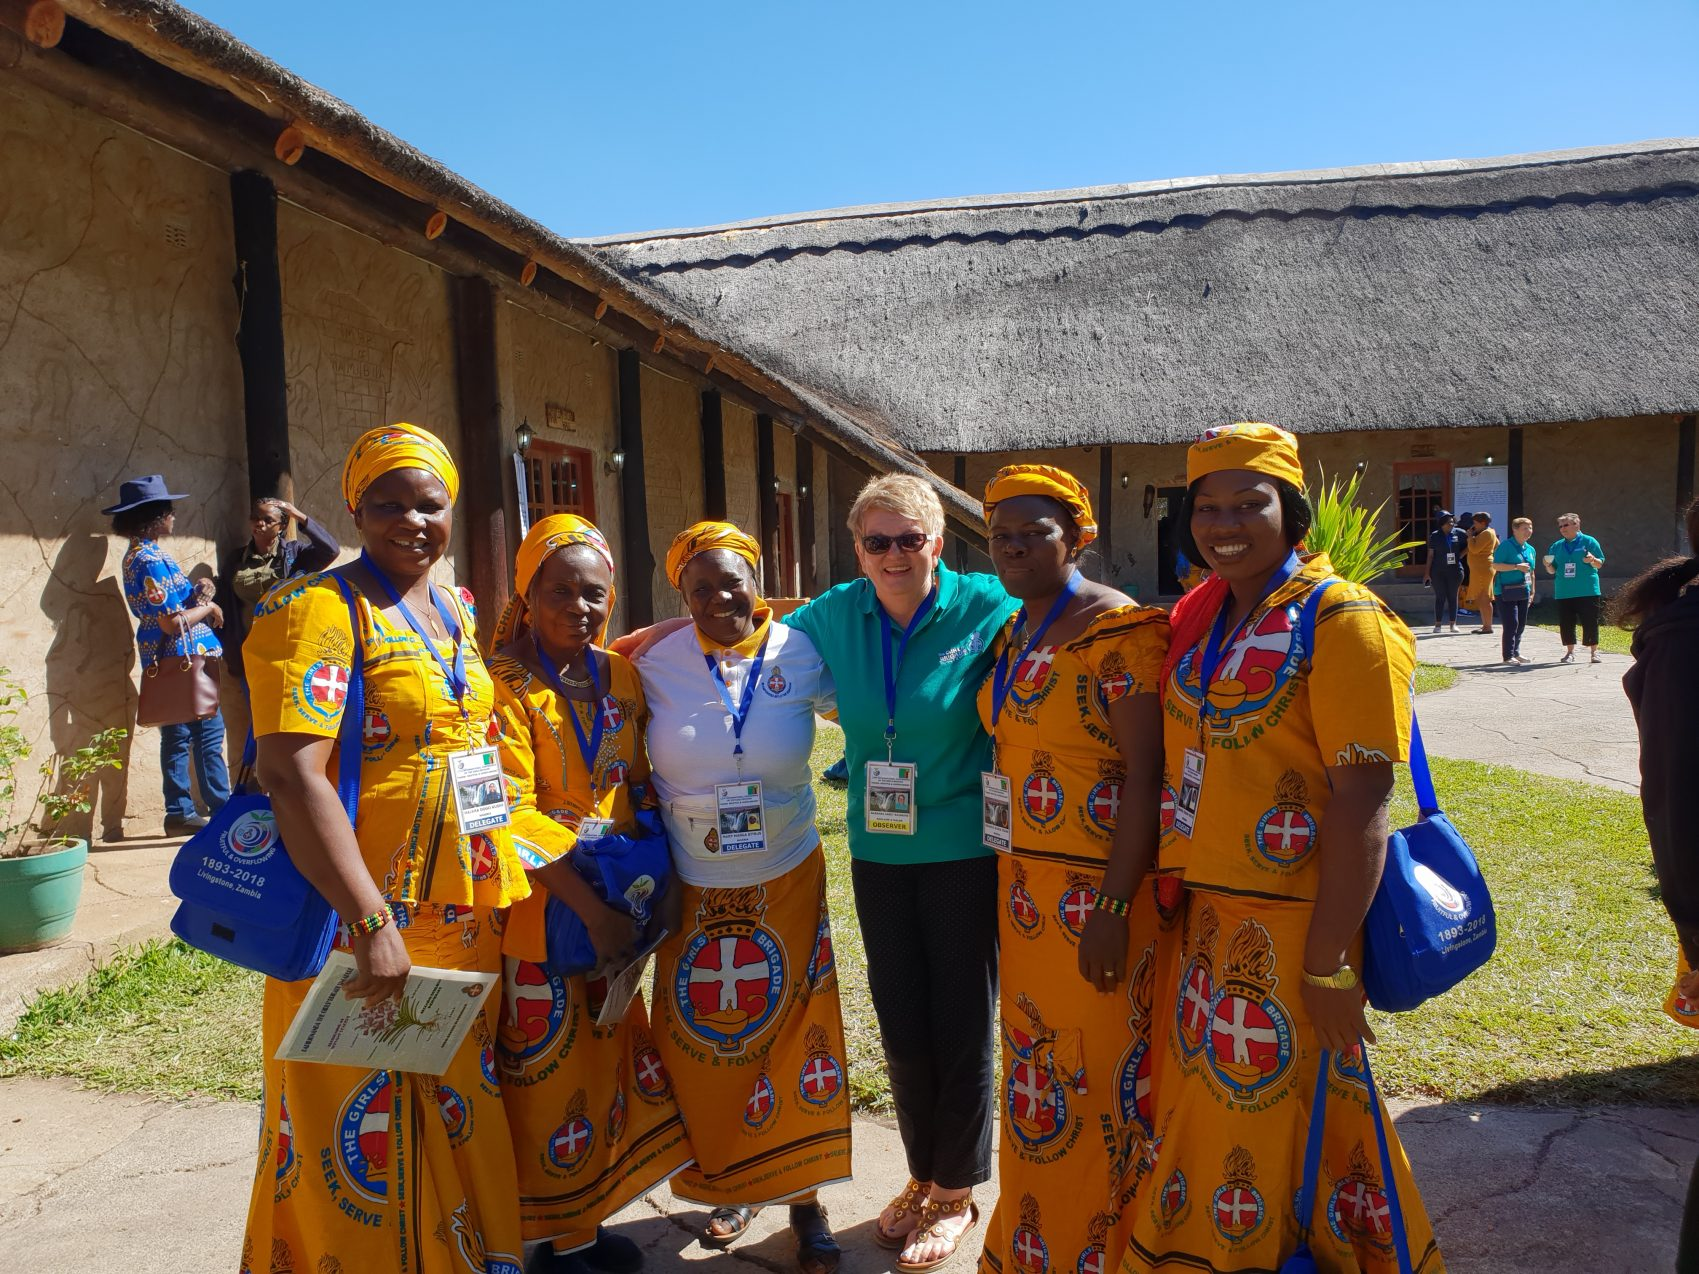 Girls' Brigade England and Wales volunteer with international Girls' Brigade members